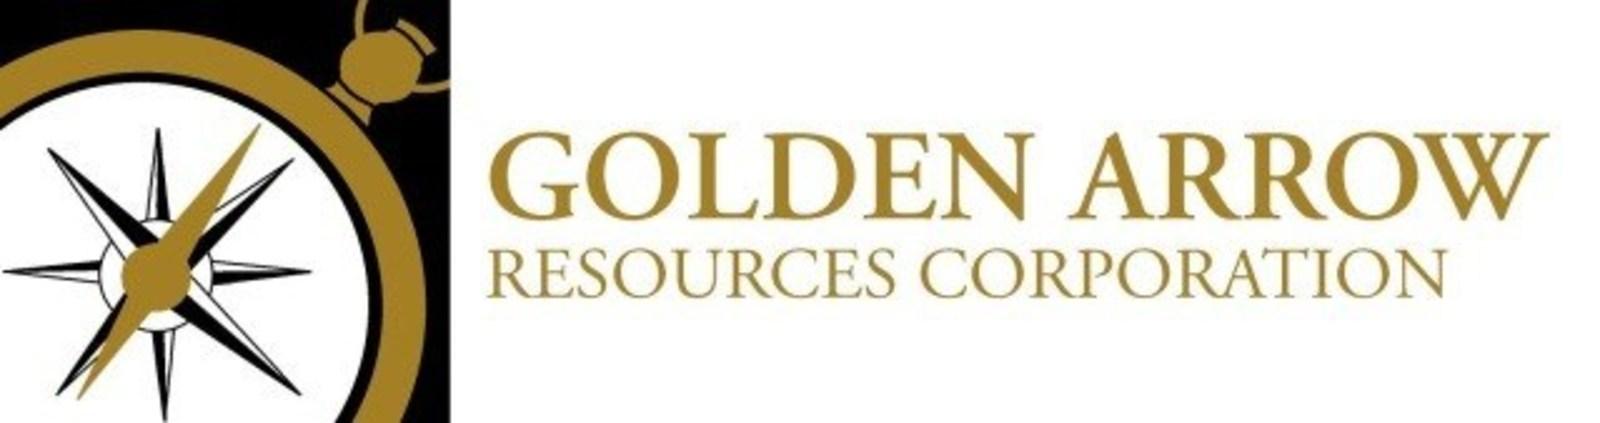 Golden Arrow Resources Corporation